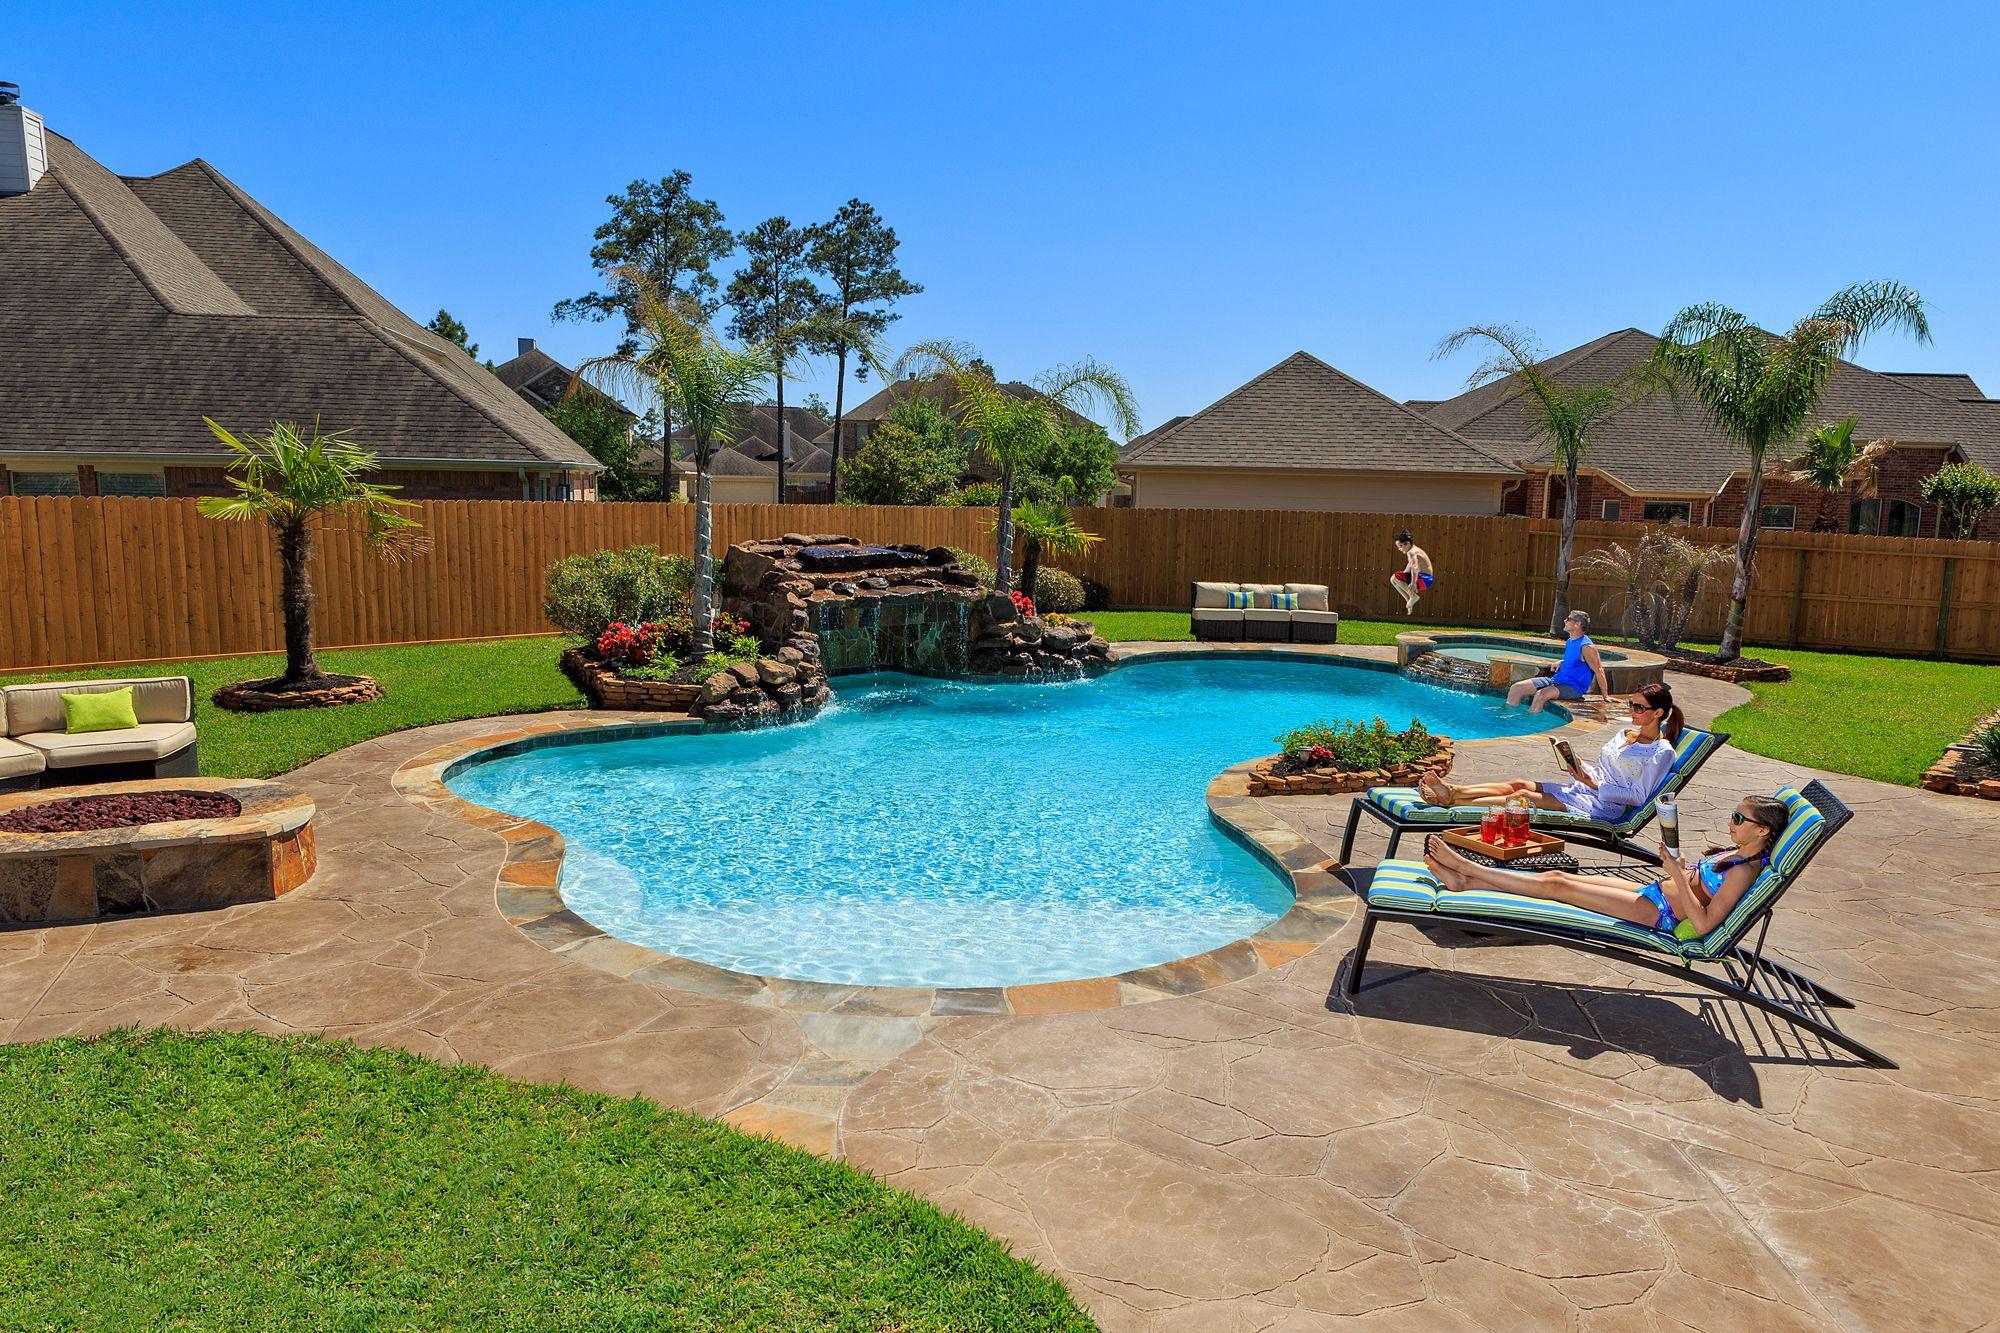 pool ideas designs pictures pool decorating page 5 pools pinterest piscine picine. Black Bedroom Furniture Sets. Home Design Ideas